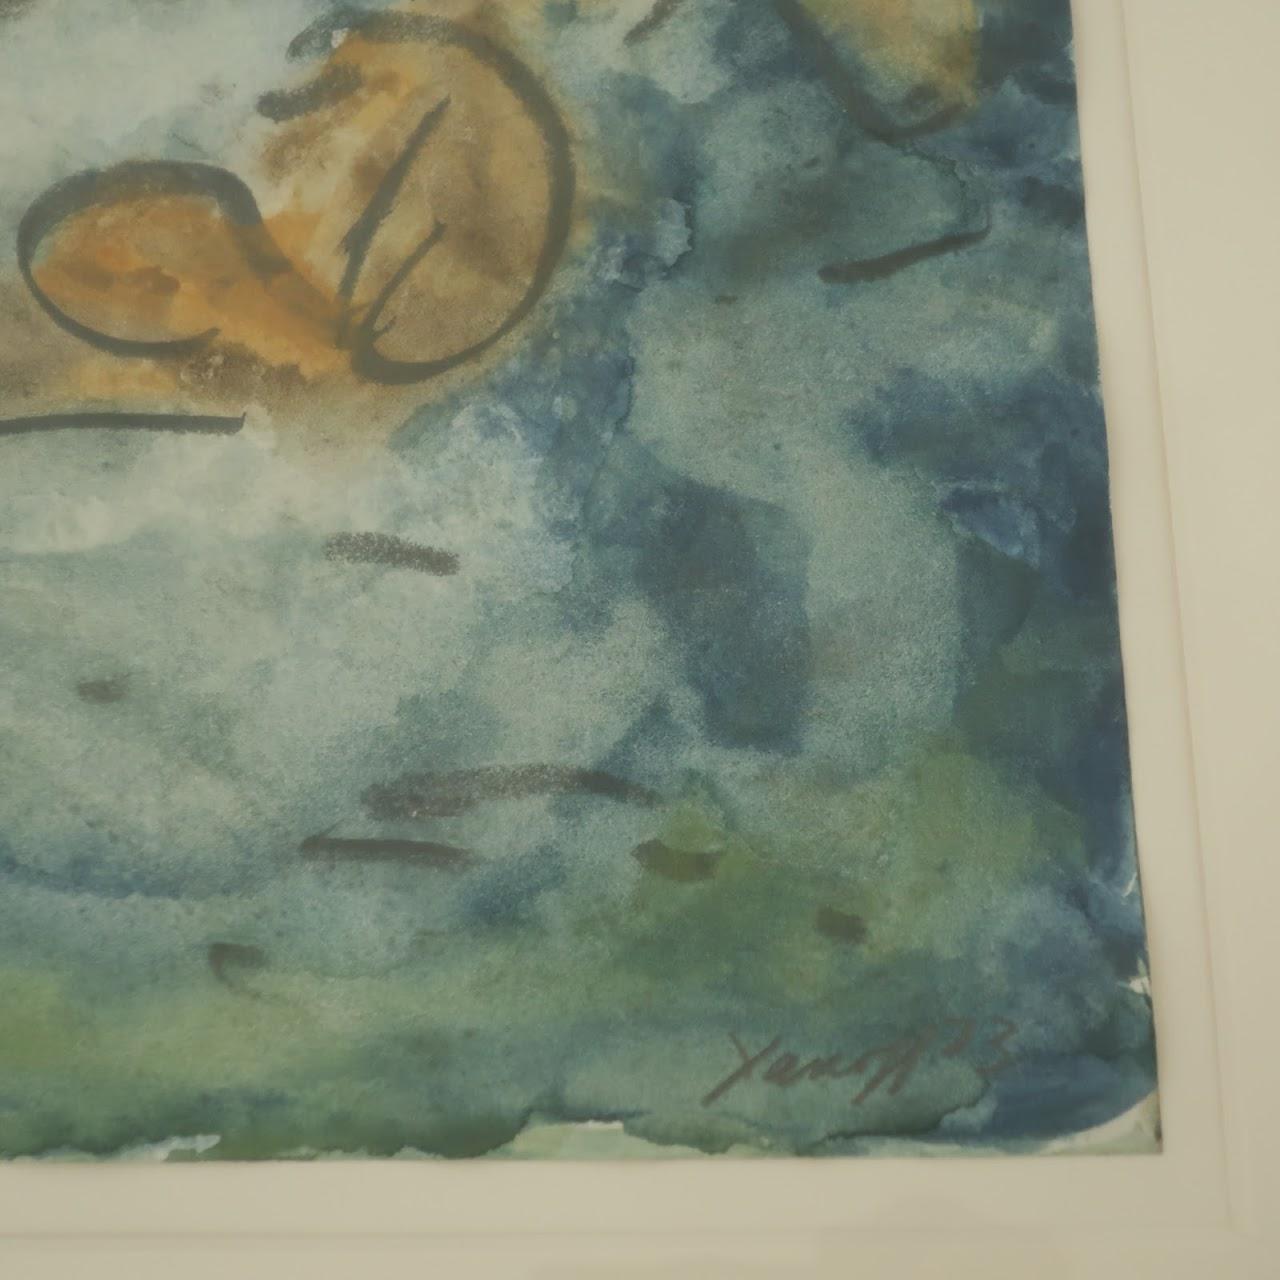 Arthur Yanoff Signed Watercolor Painting